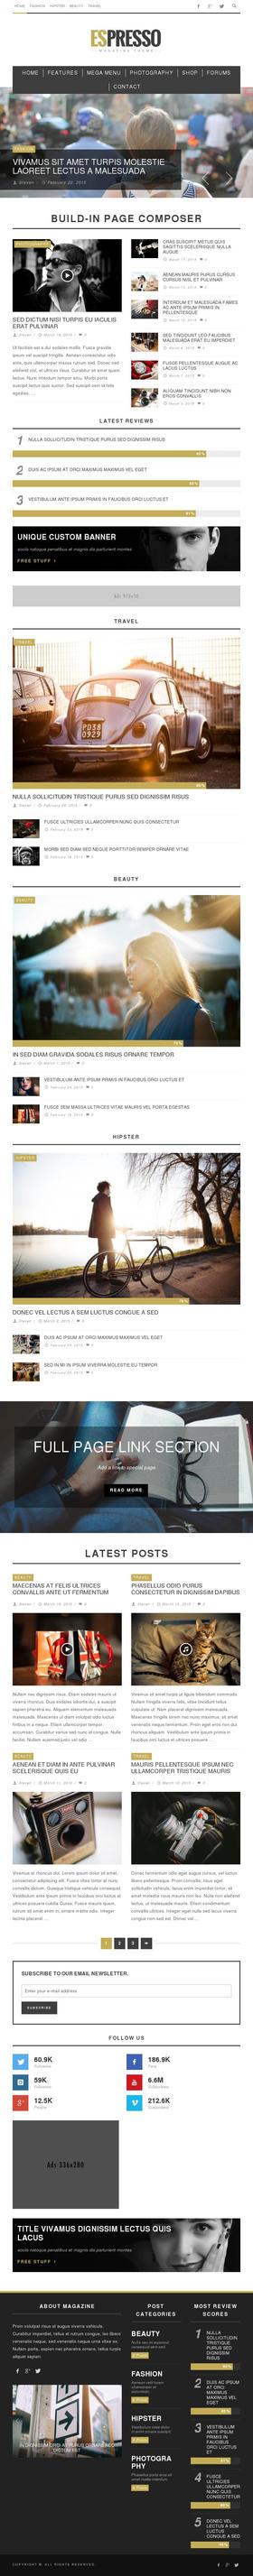 ESPRESSO - Magazine / Newspaper WordPress Theme by AllResourcess